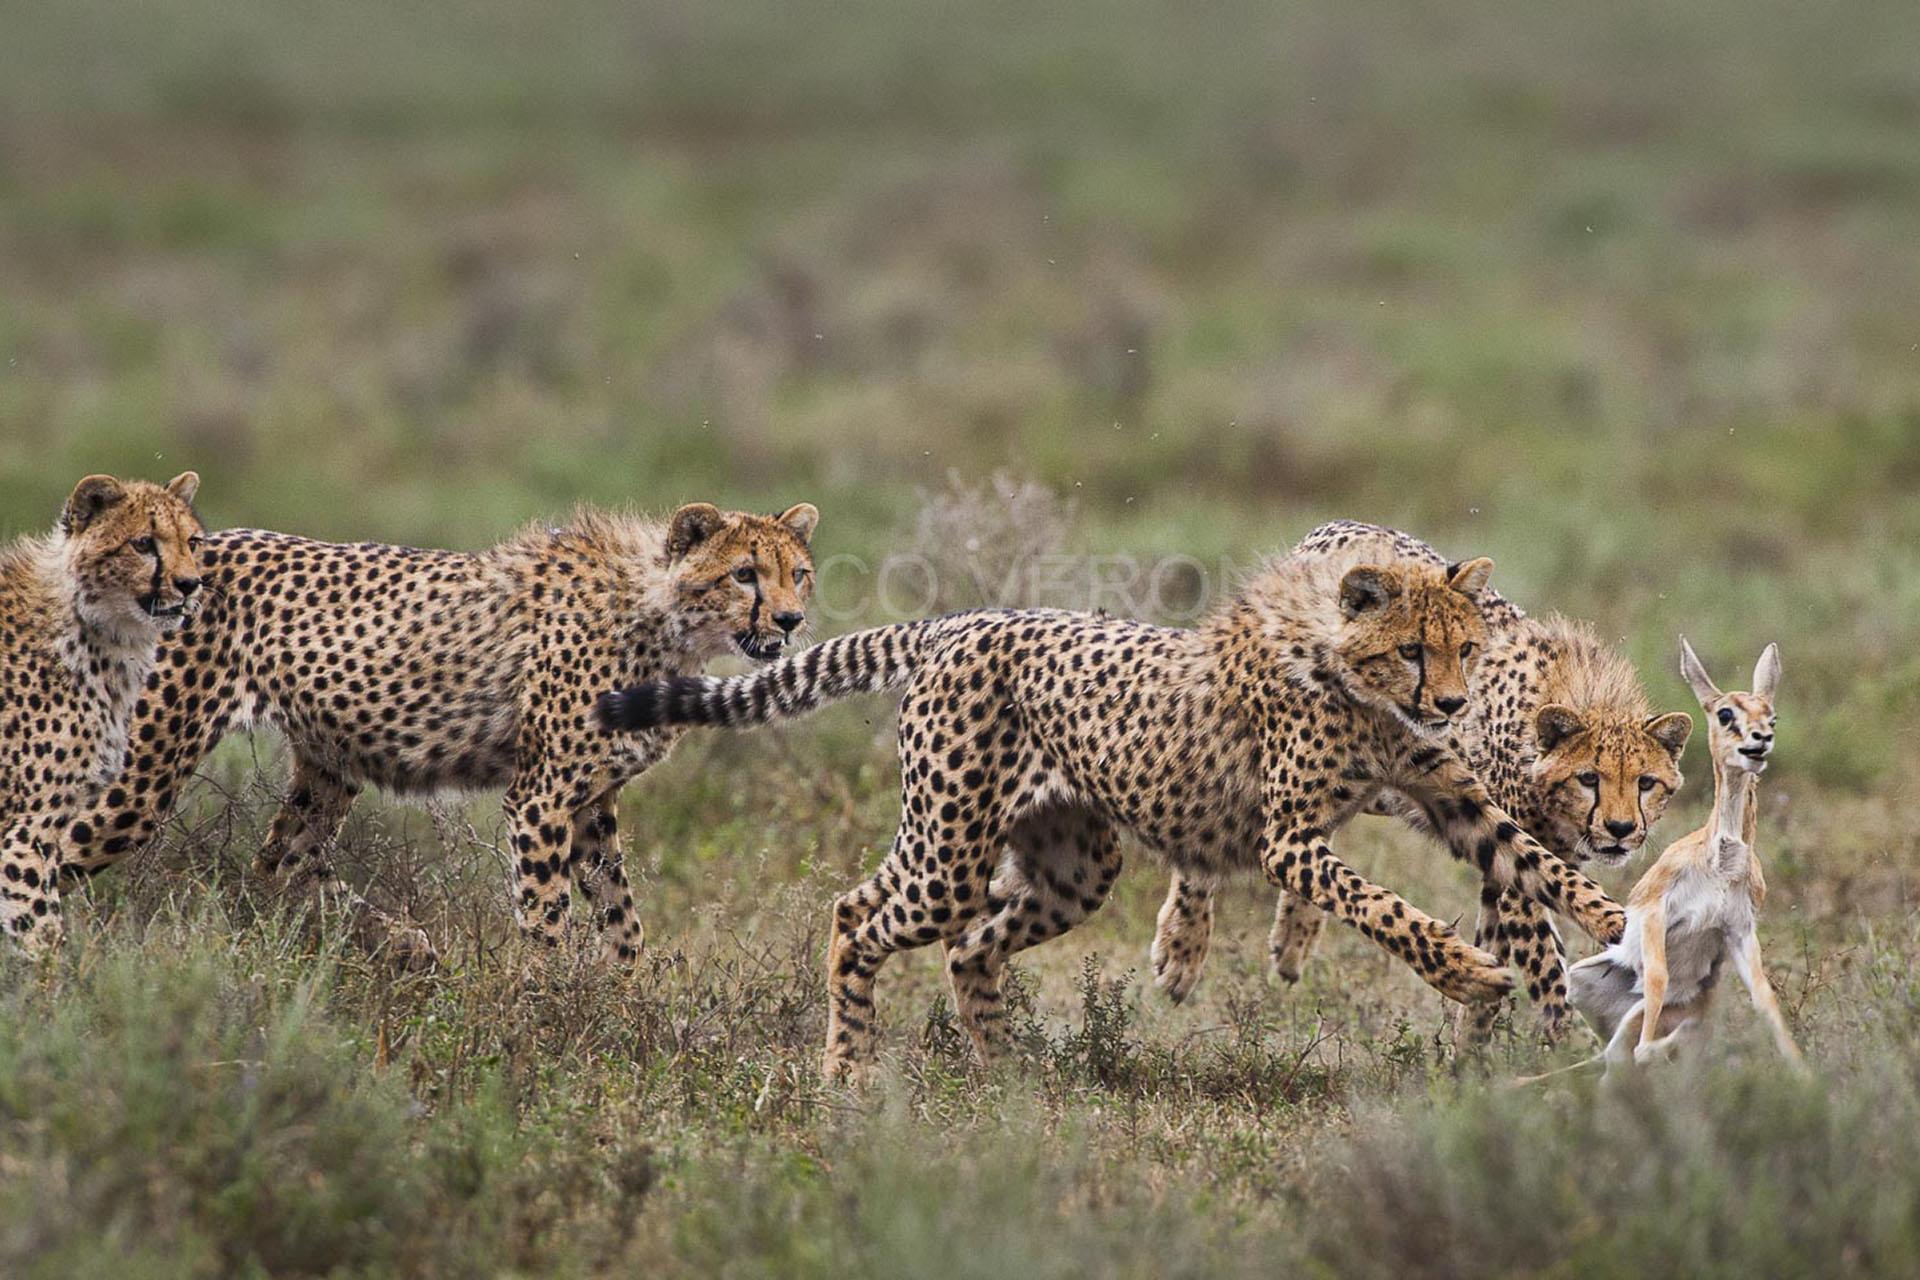 federico-veronesi-photography-signature-photo-safaris-maasai-wanderings-africa-wildlife-cheetahs